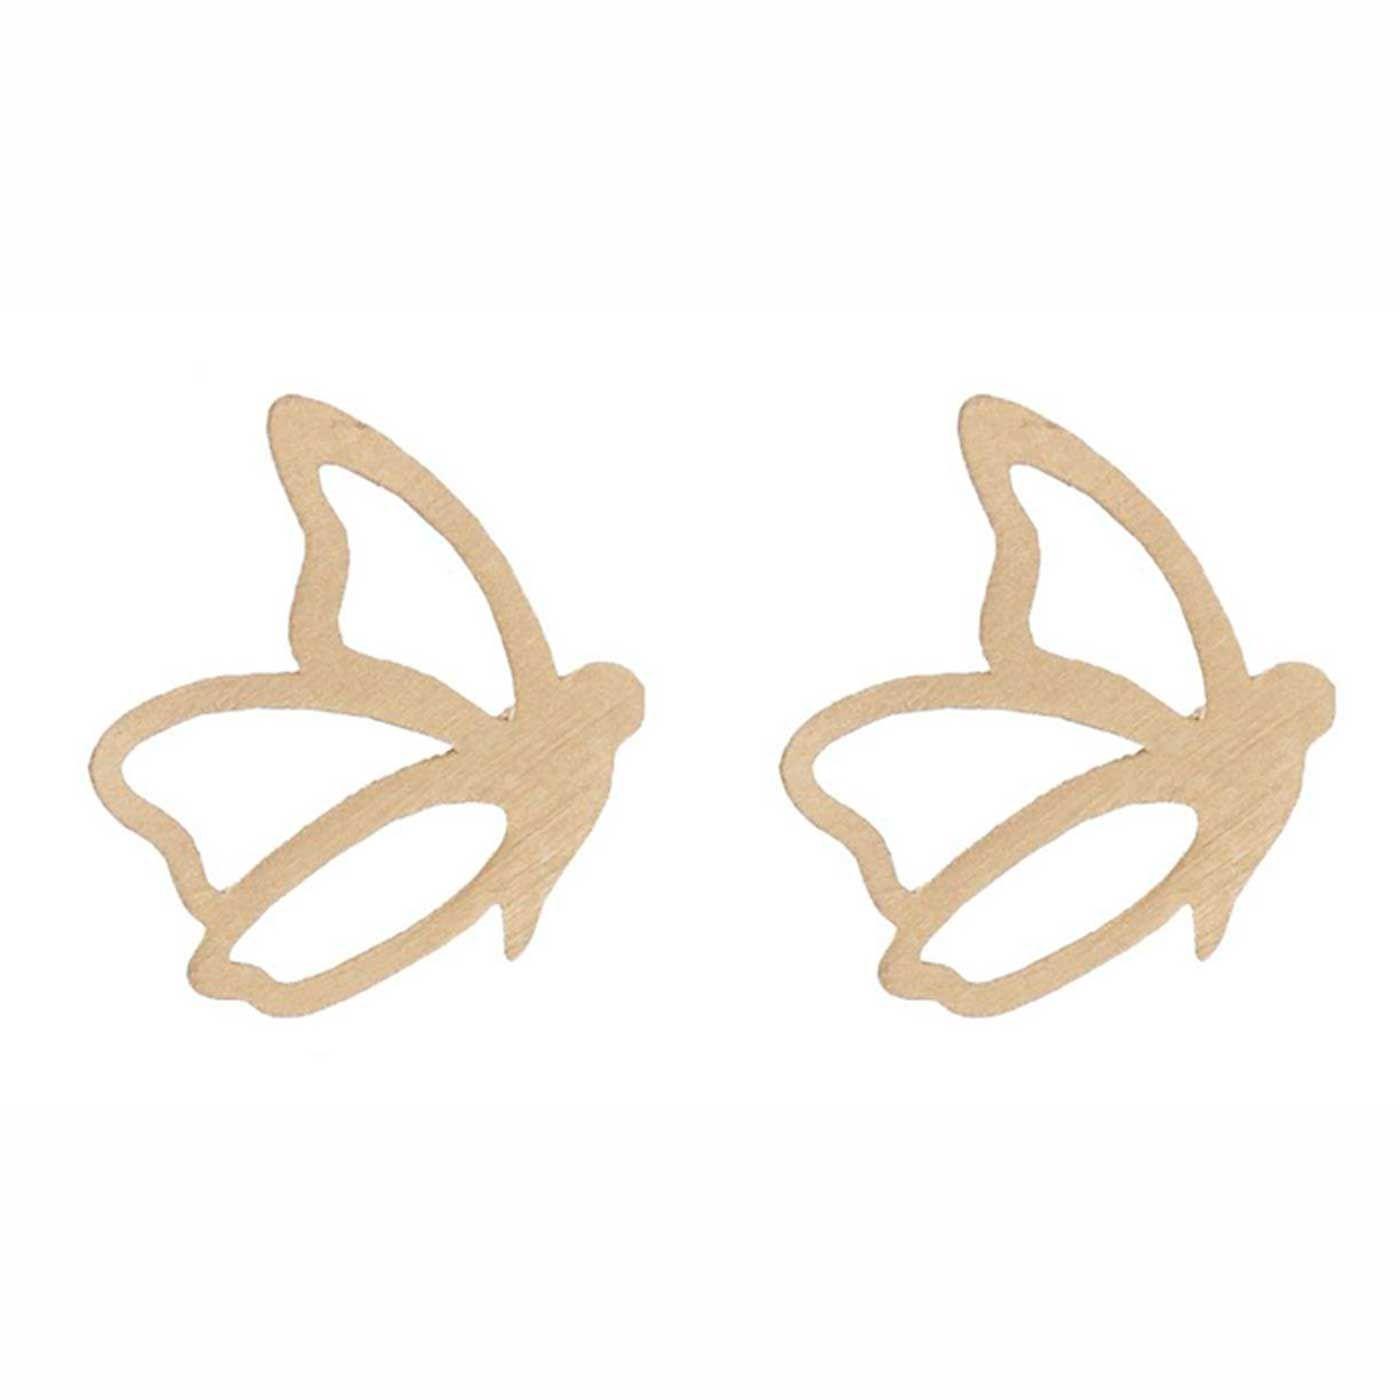 گوشواره طلا 18 عیار زنانه کانیار گالری کد GOA96 -  - 3